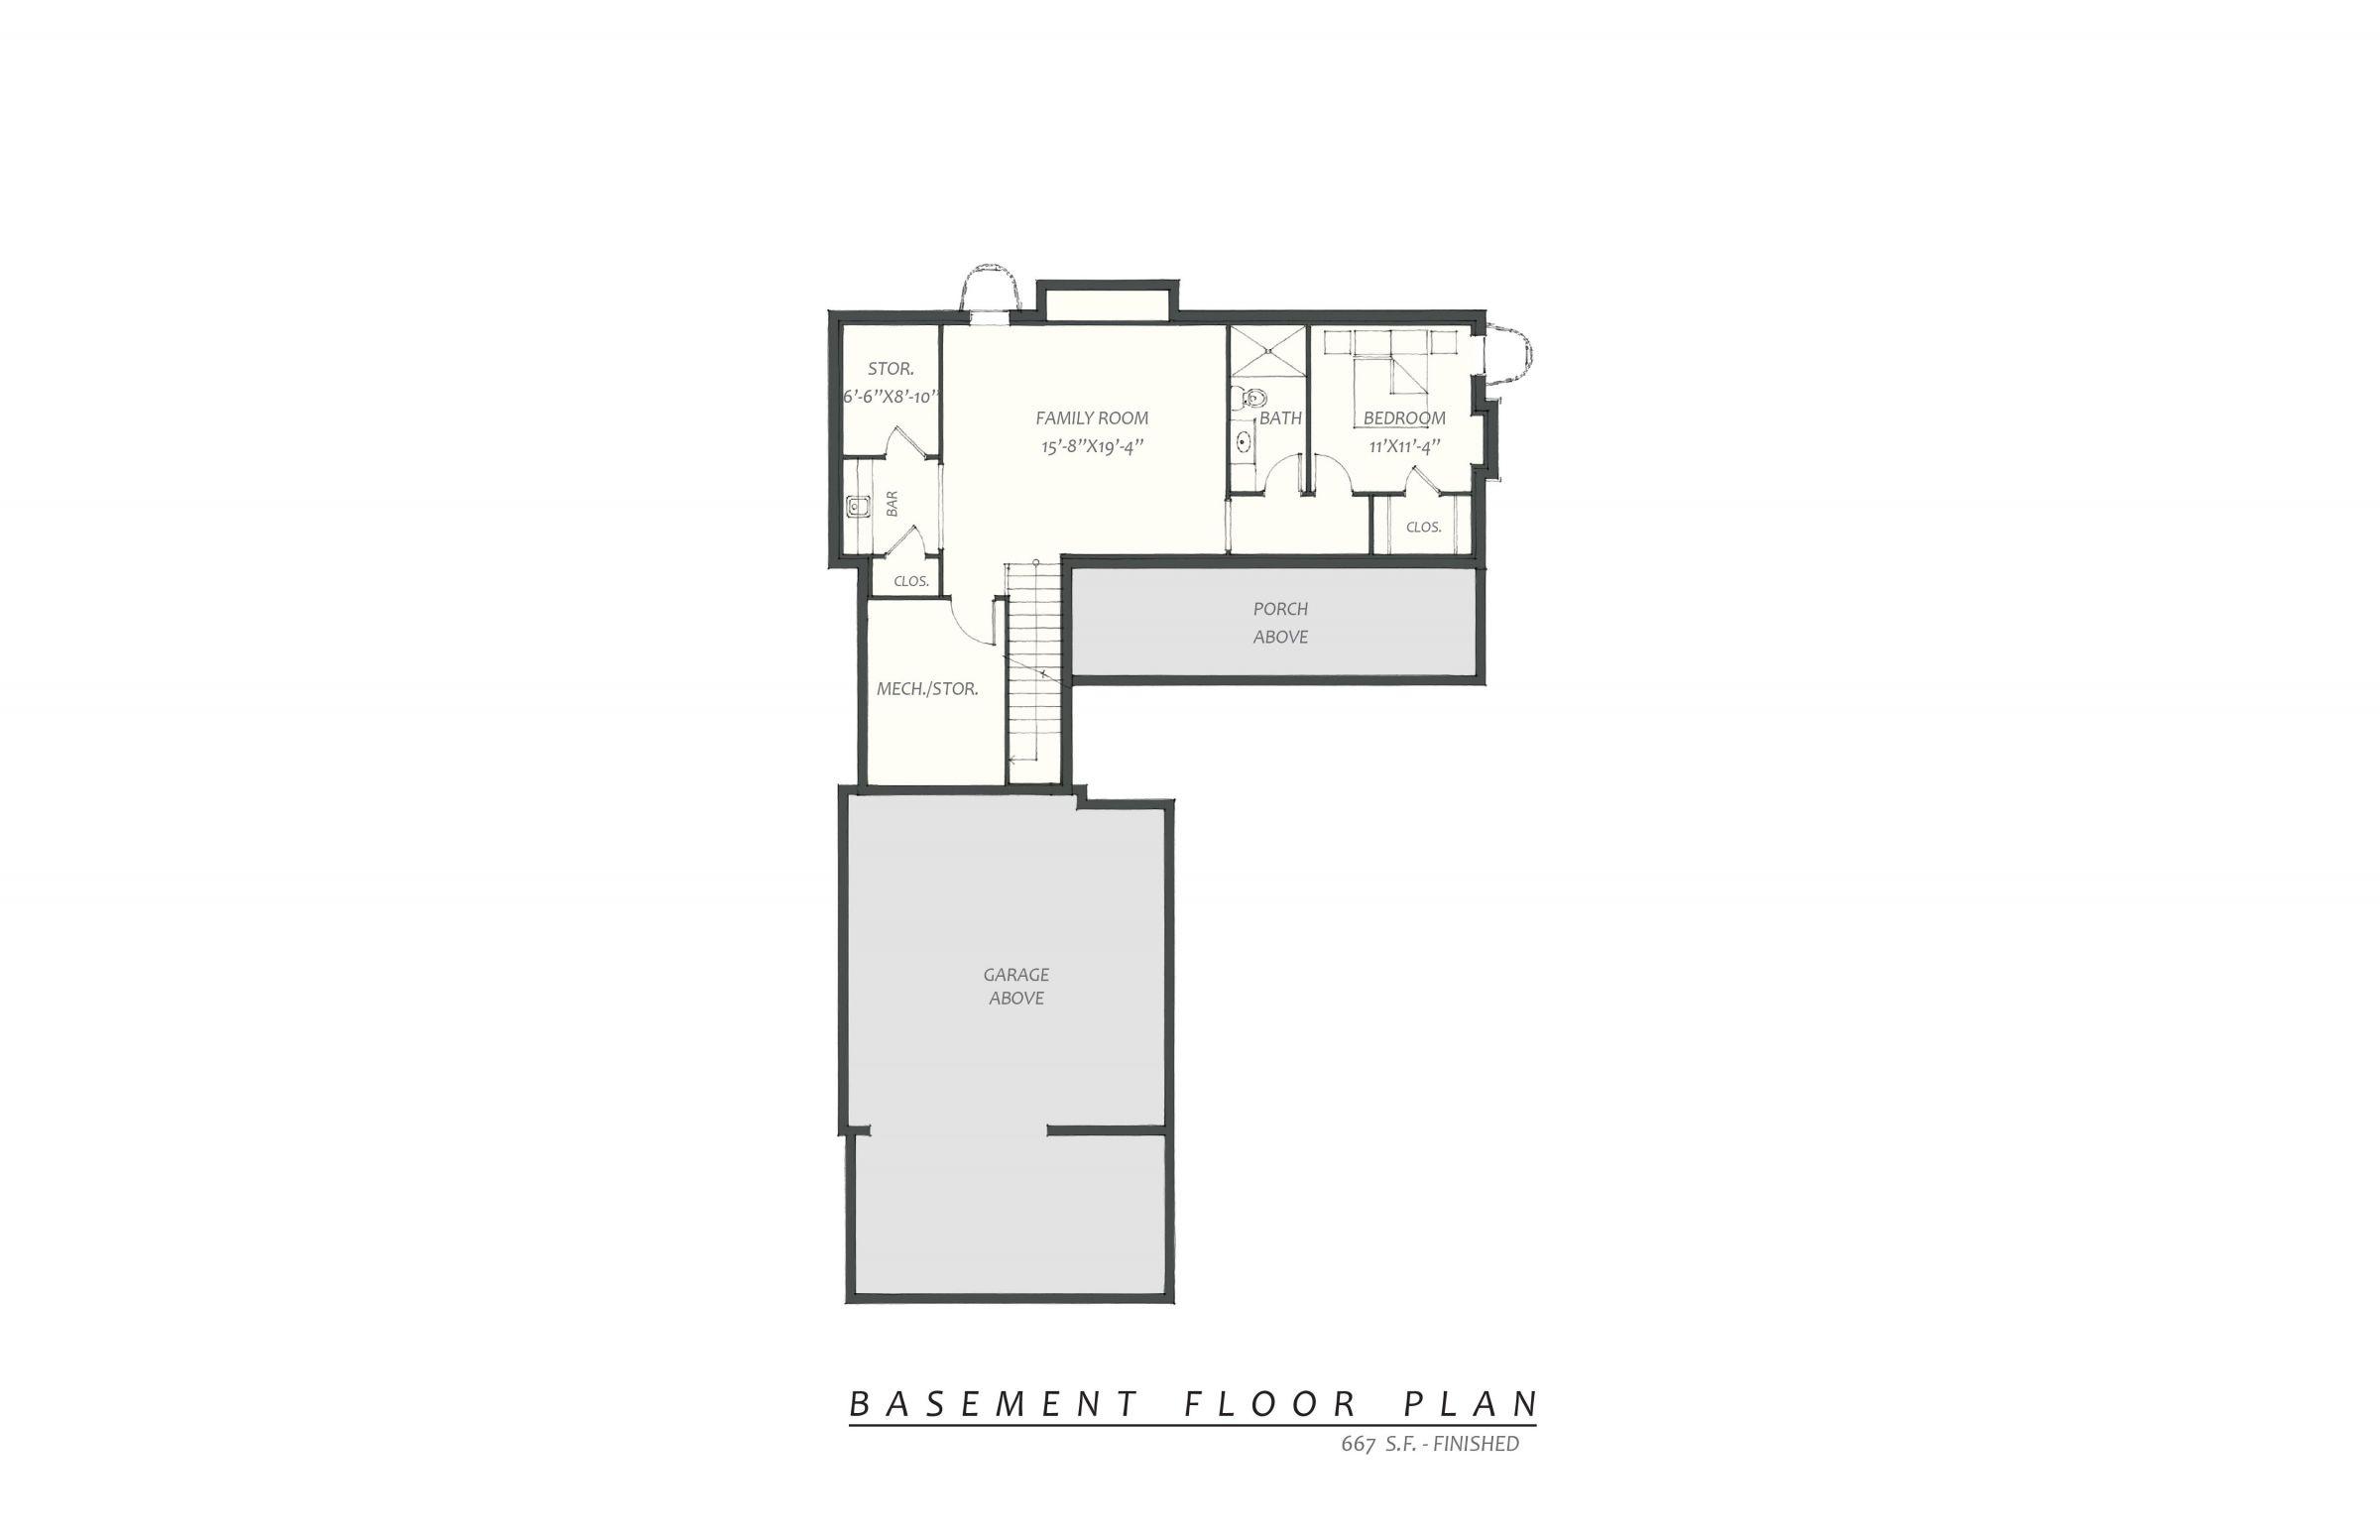 residential-warren-county-iowa-0-acres-listing-number-15621-0-2021-07-02-162120.jpg